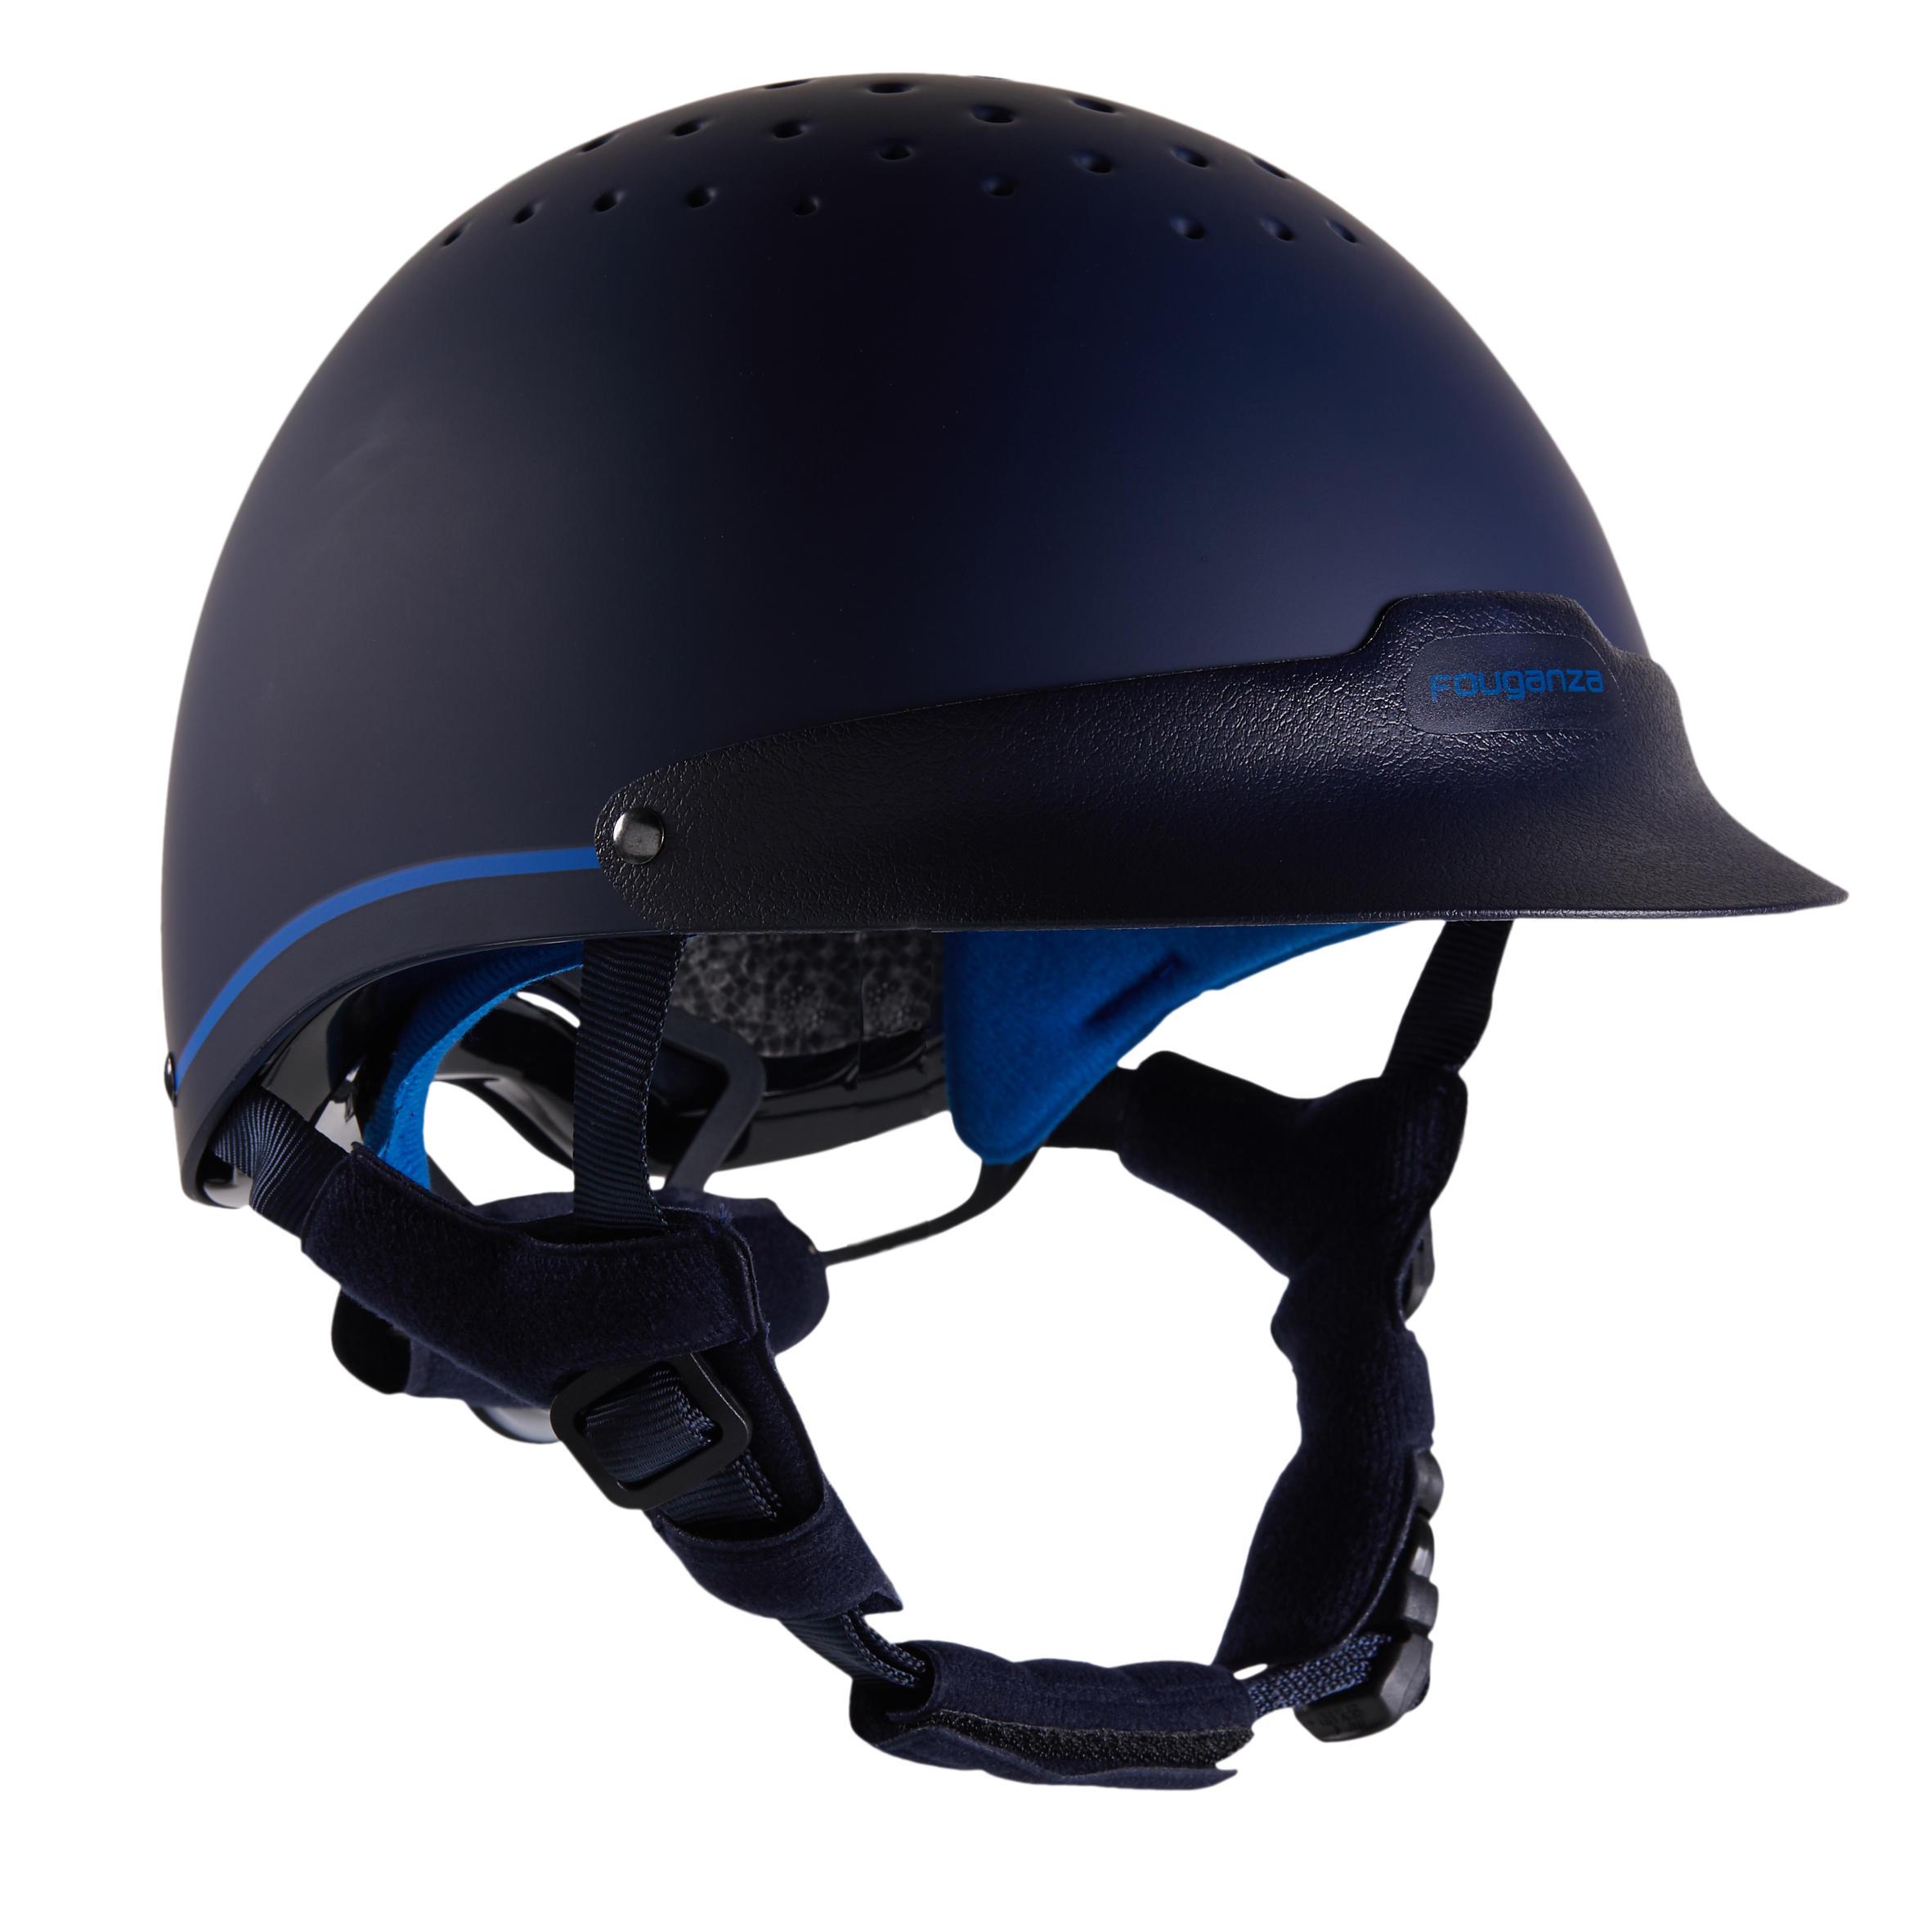 120 Riding Helmet - Navy/Royal Blue - M/55-58cm By FOUGANZA | Decathlon